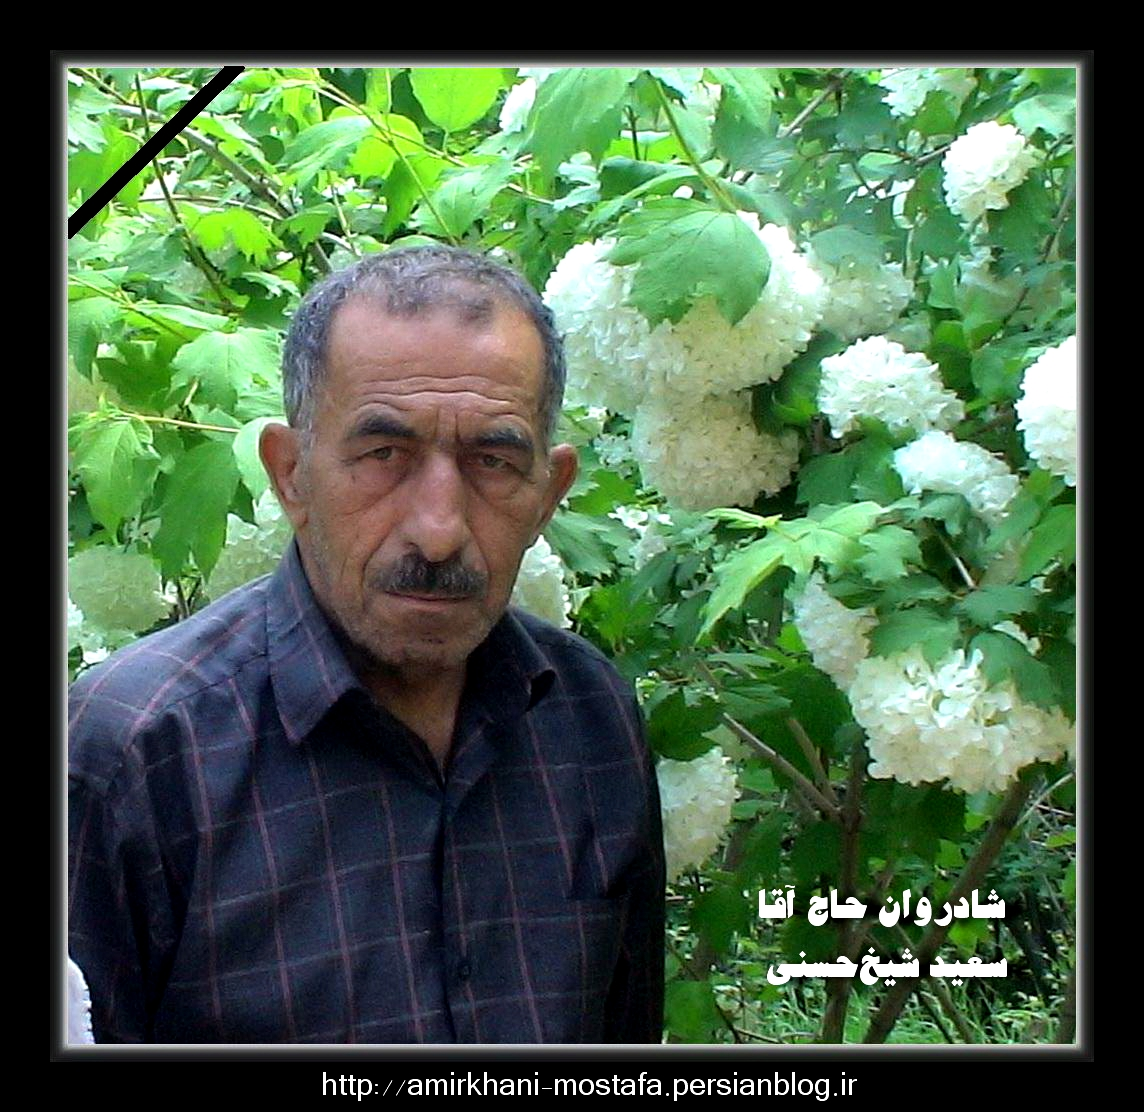 تکیه ناوه ، طالقان ، مرحوم حاج سعید شیخ حسنی